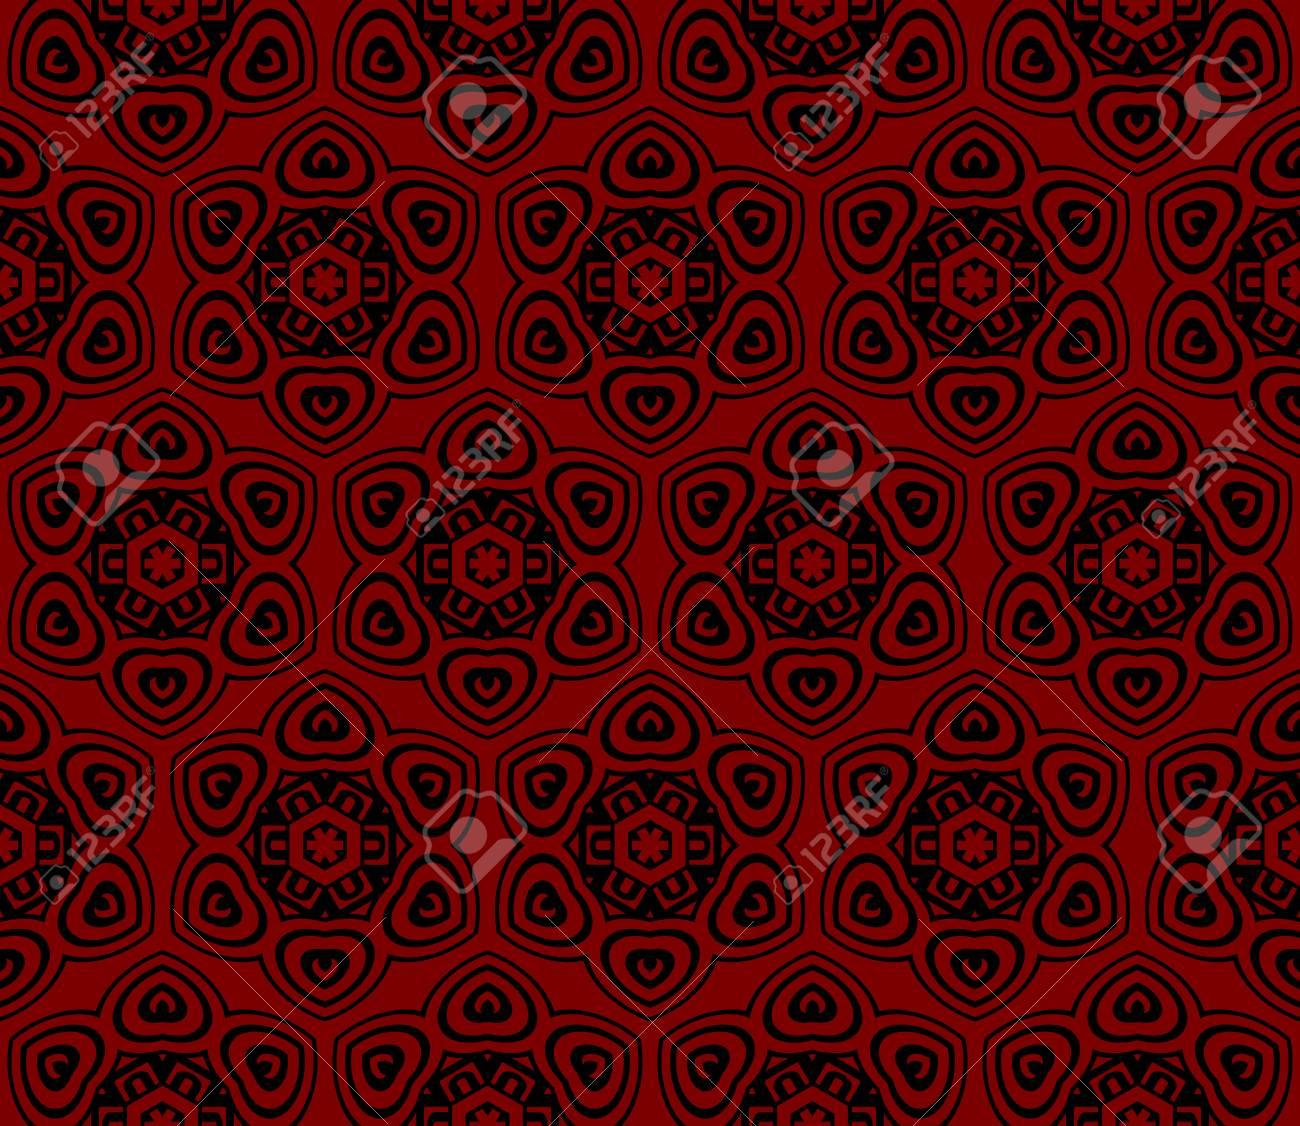 vector illustration. new modern geometric pattern. seamless design for scrapbooking, background, interior - 101701067